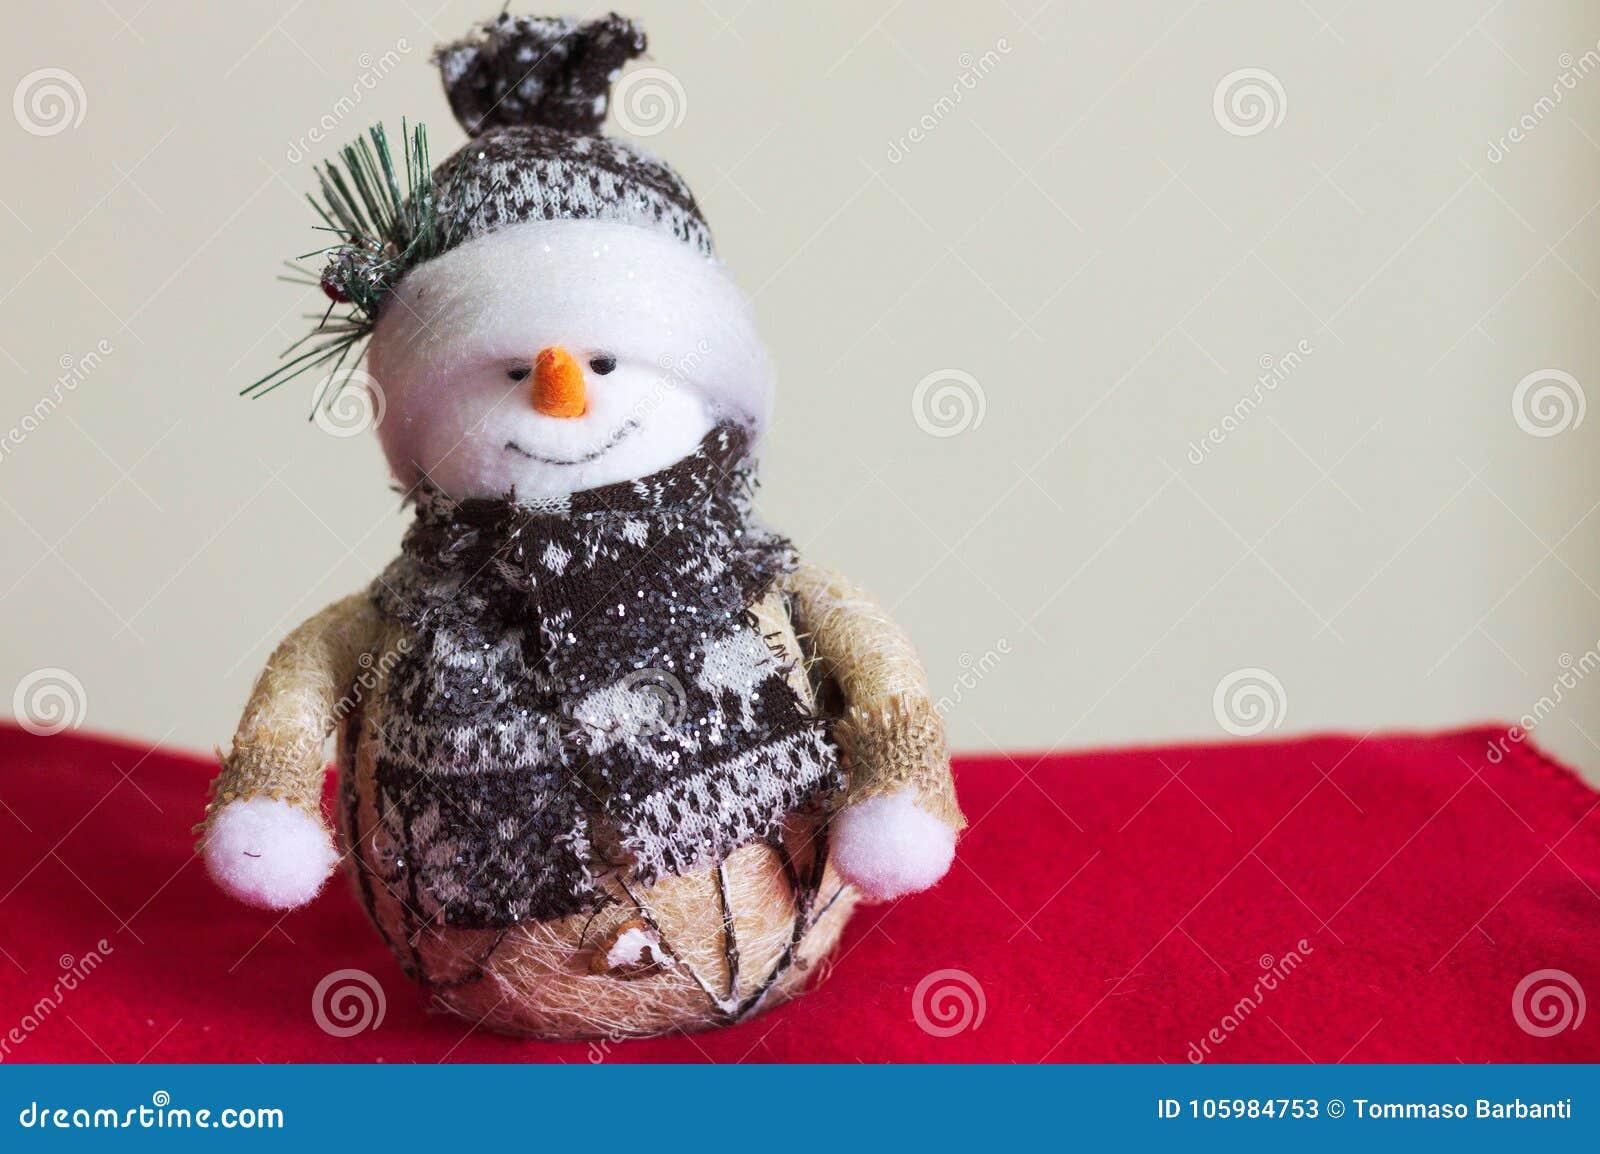 Snowman - Interior Design - Christmas Decorations Stock Image ...